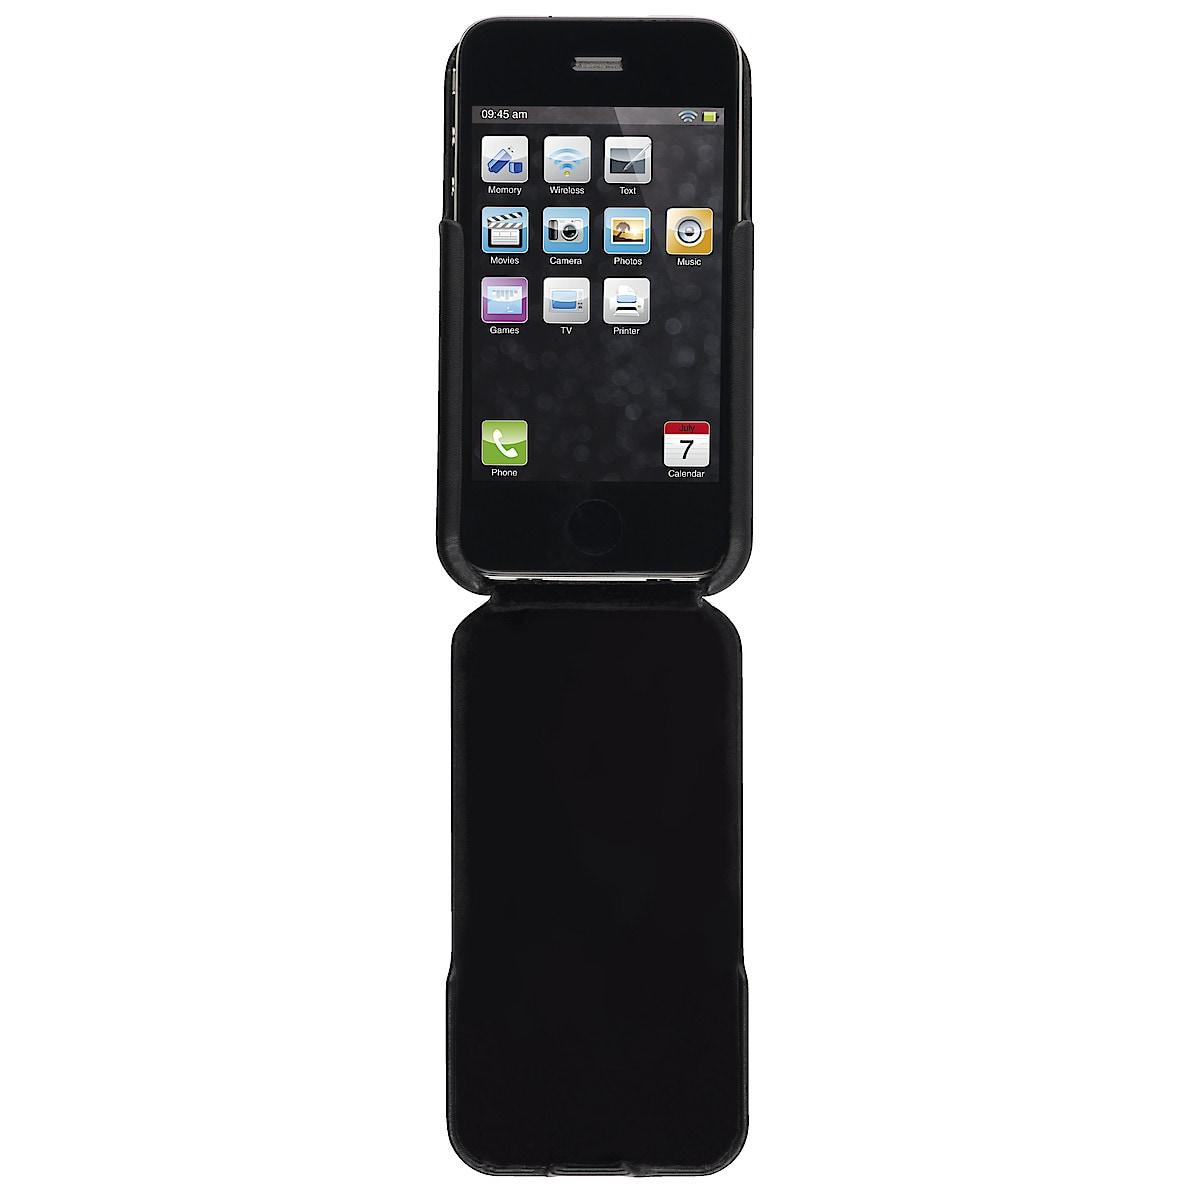 Fodral för iPhone 4/4S